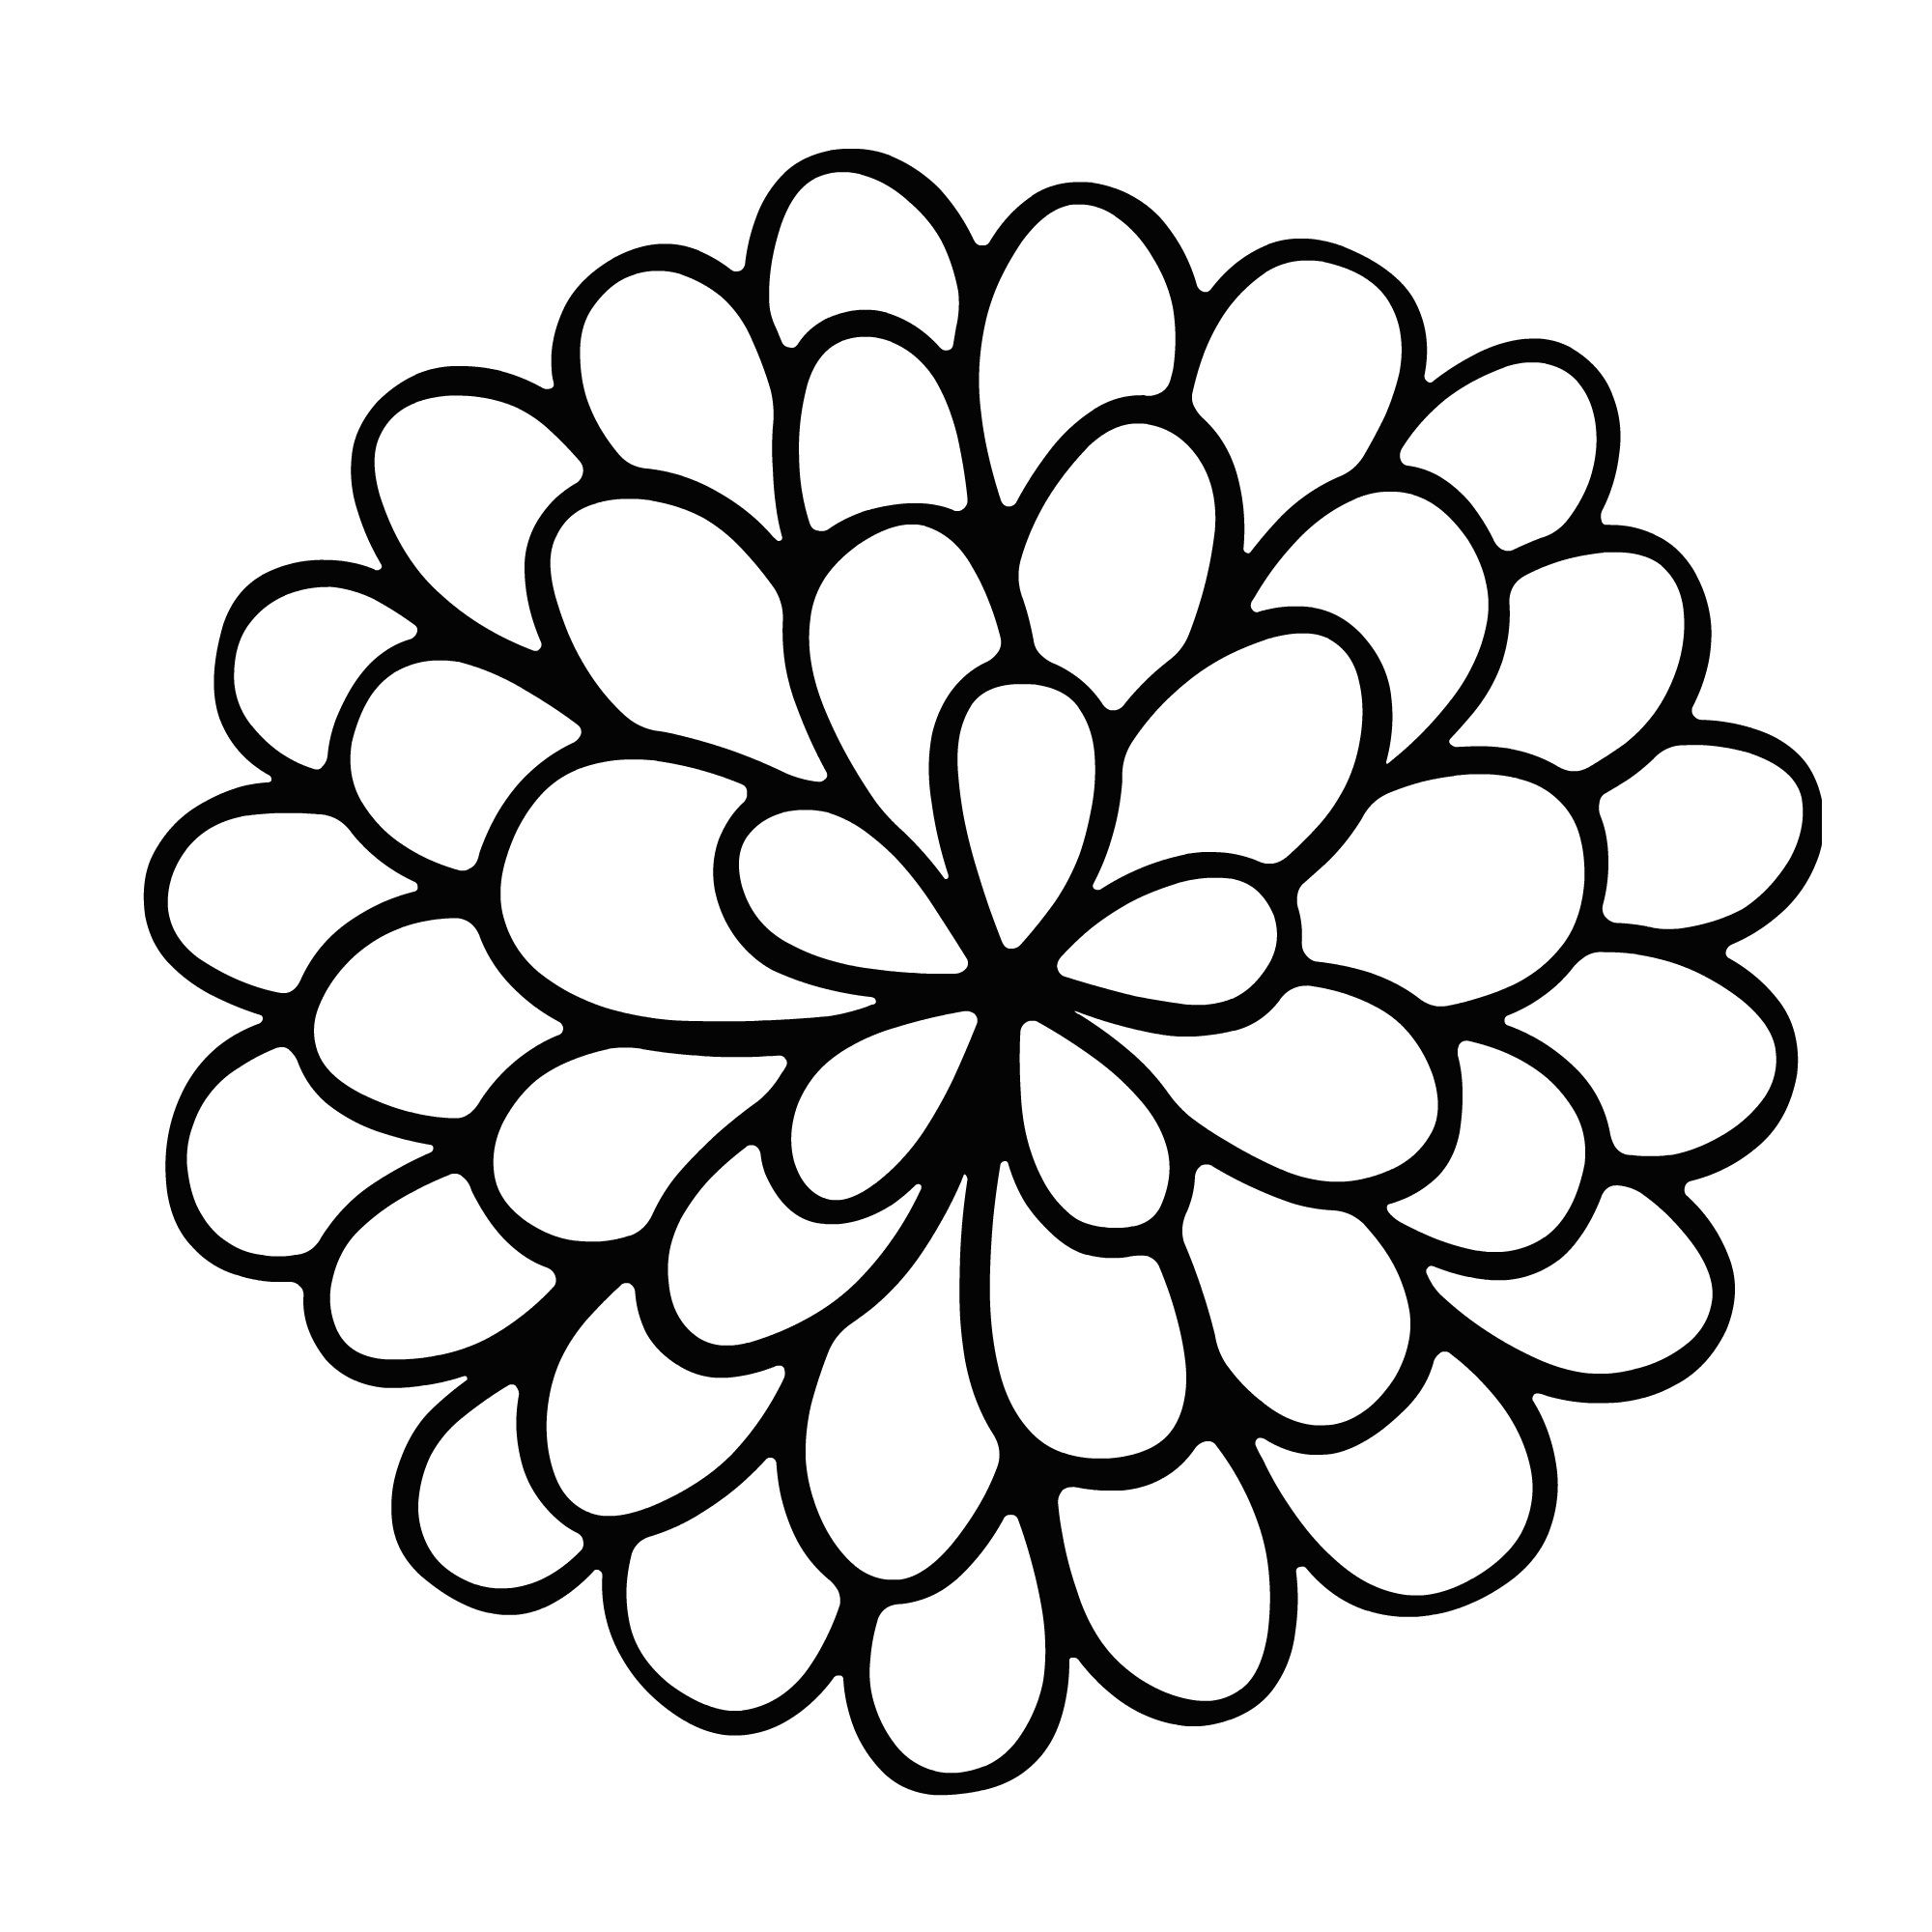 freeuse download Marigolds drawing. Marigold flower easy sketch.